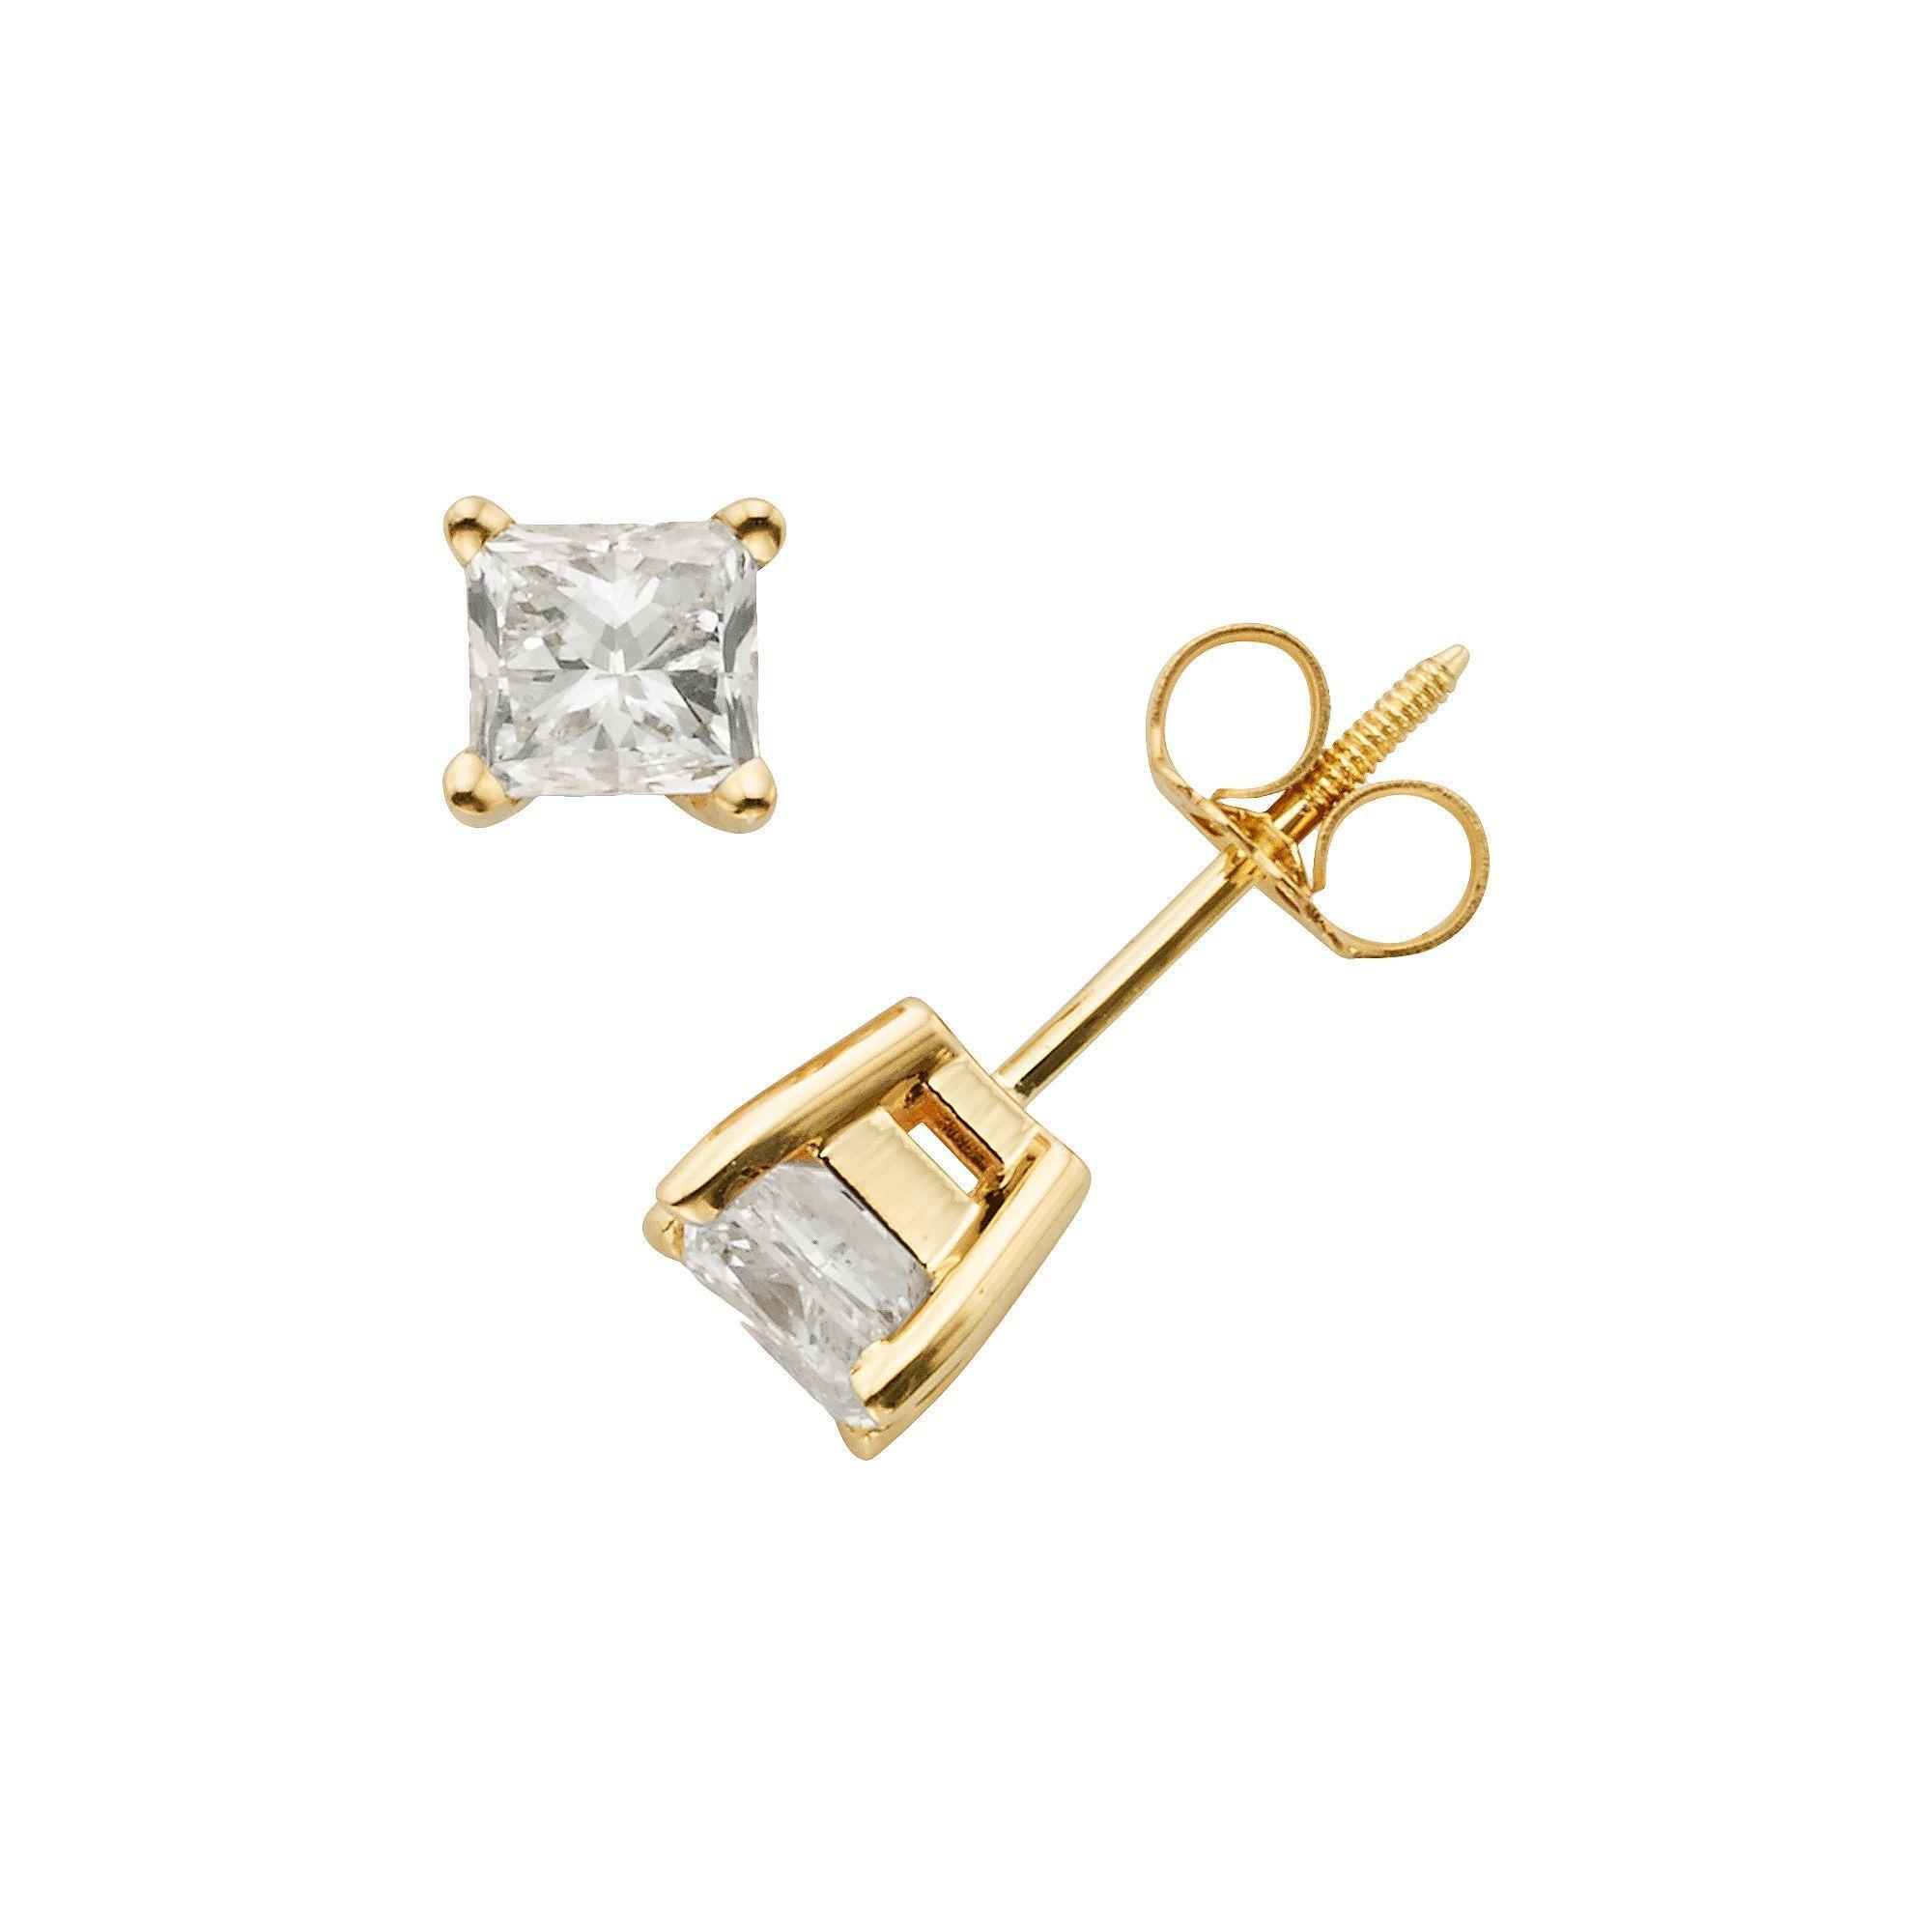 14k Gold 1 ct T W IGI Certified Princess Cut Diamond Solitaire